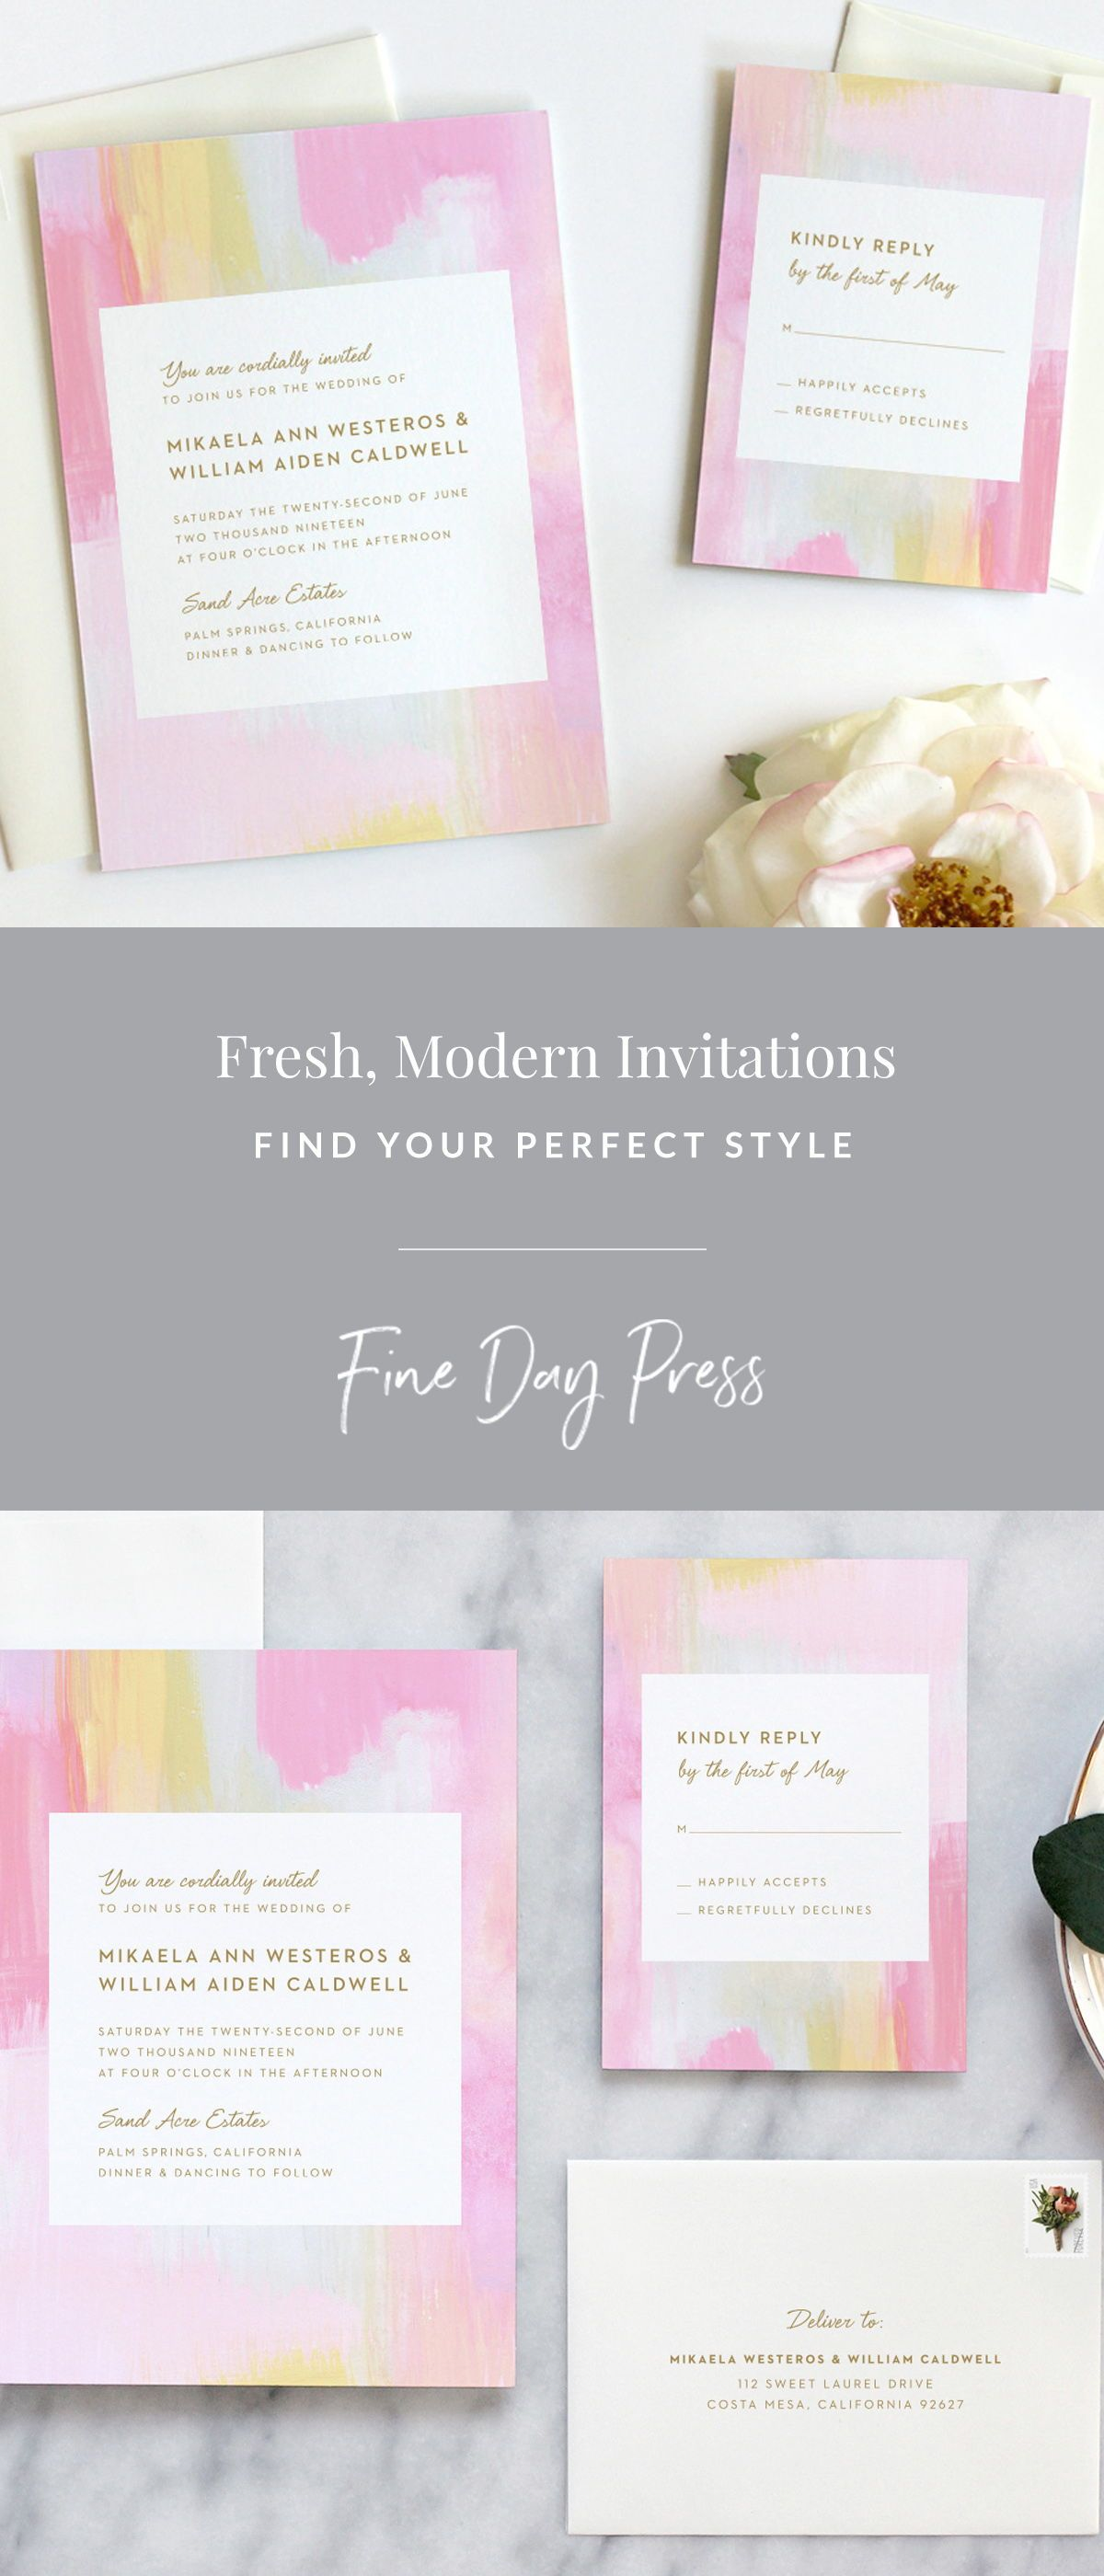 Modern art wedding invitations rose in wedding brand inspire